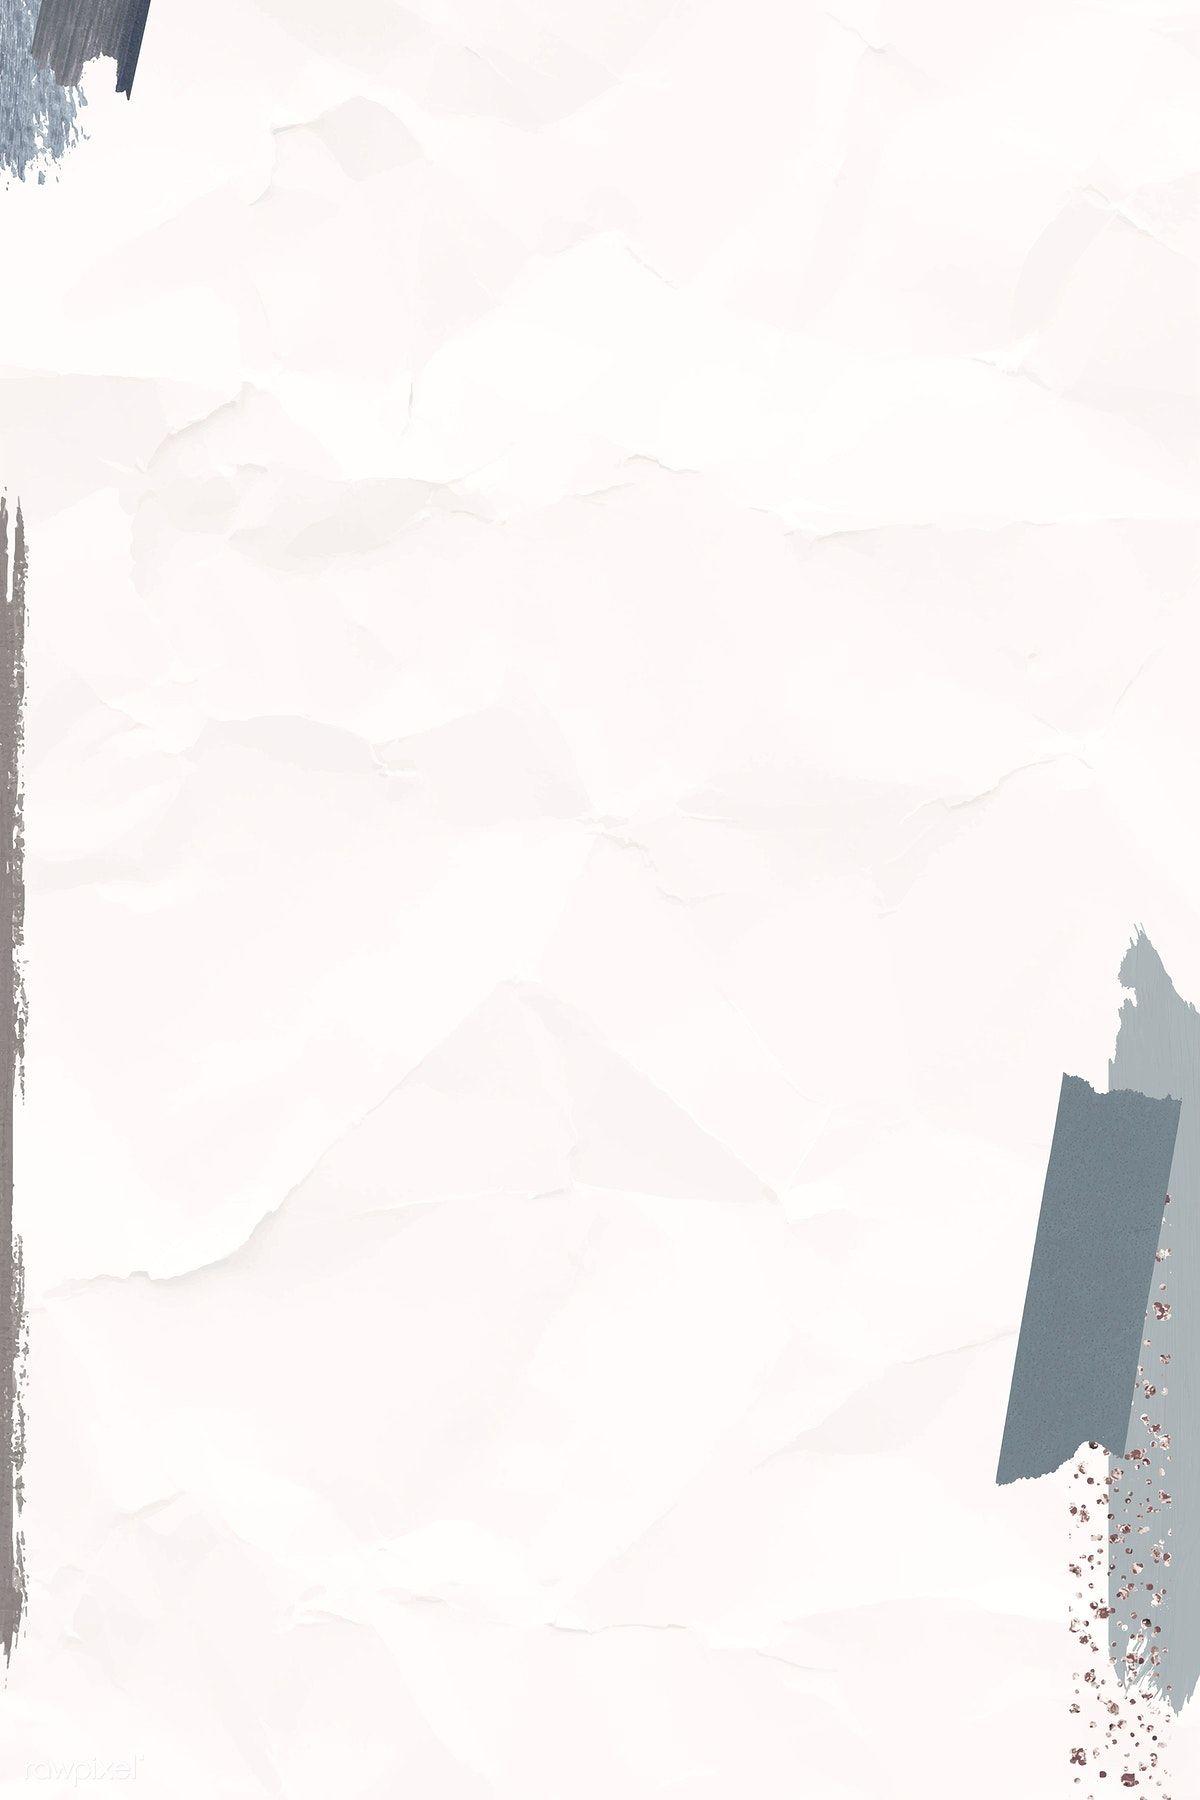 Download Premium Vector Of Gray Brushstroke On A Crumpled Paper Background Abstrak Ilustrasi Poster Foto Abstrak